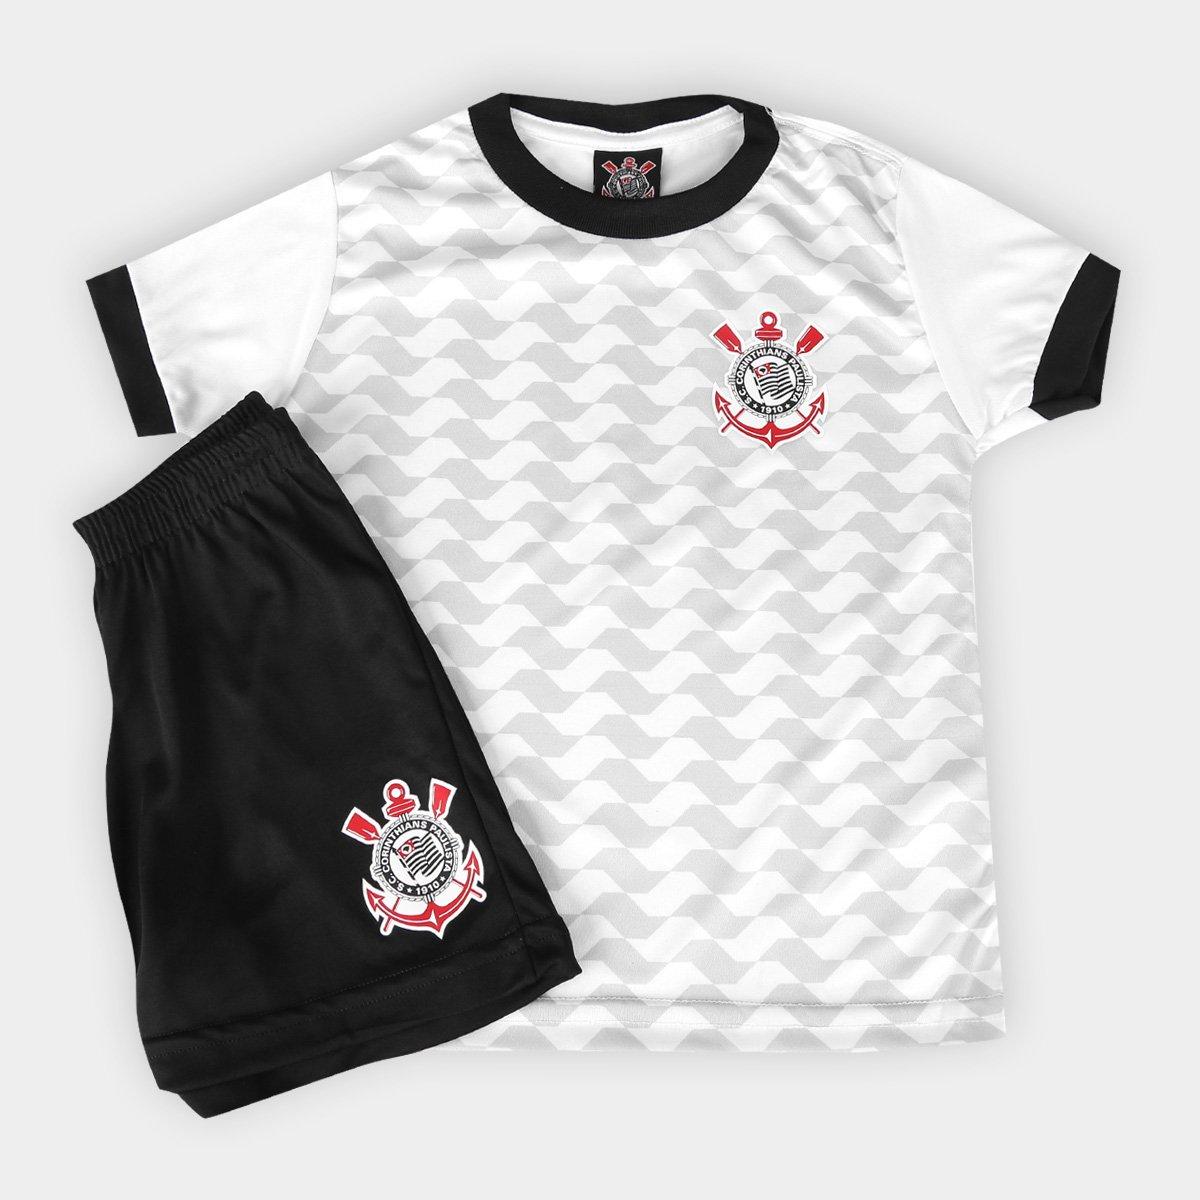 e6c271bd3e Conjunto Corinthians Libertados Infantil - Compre Agora